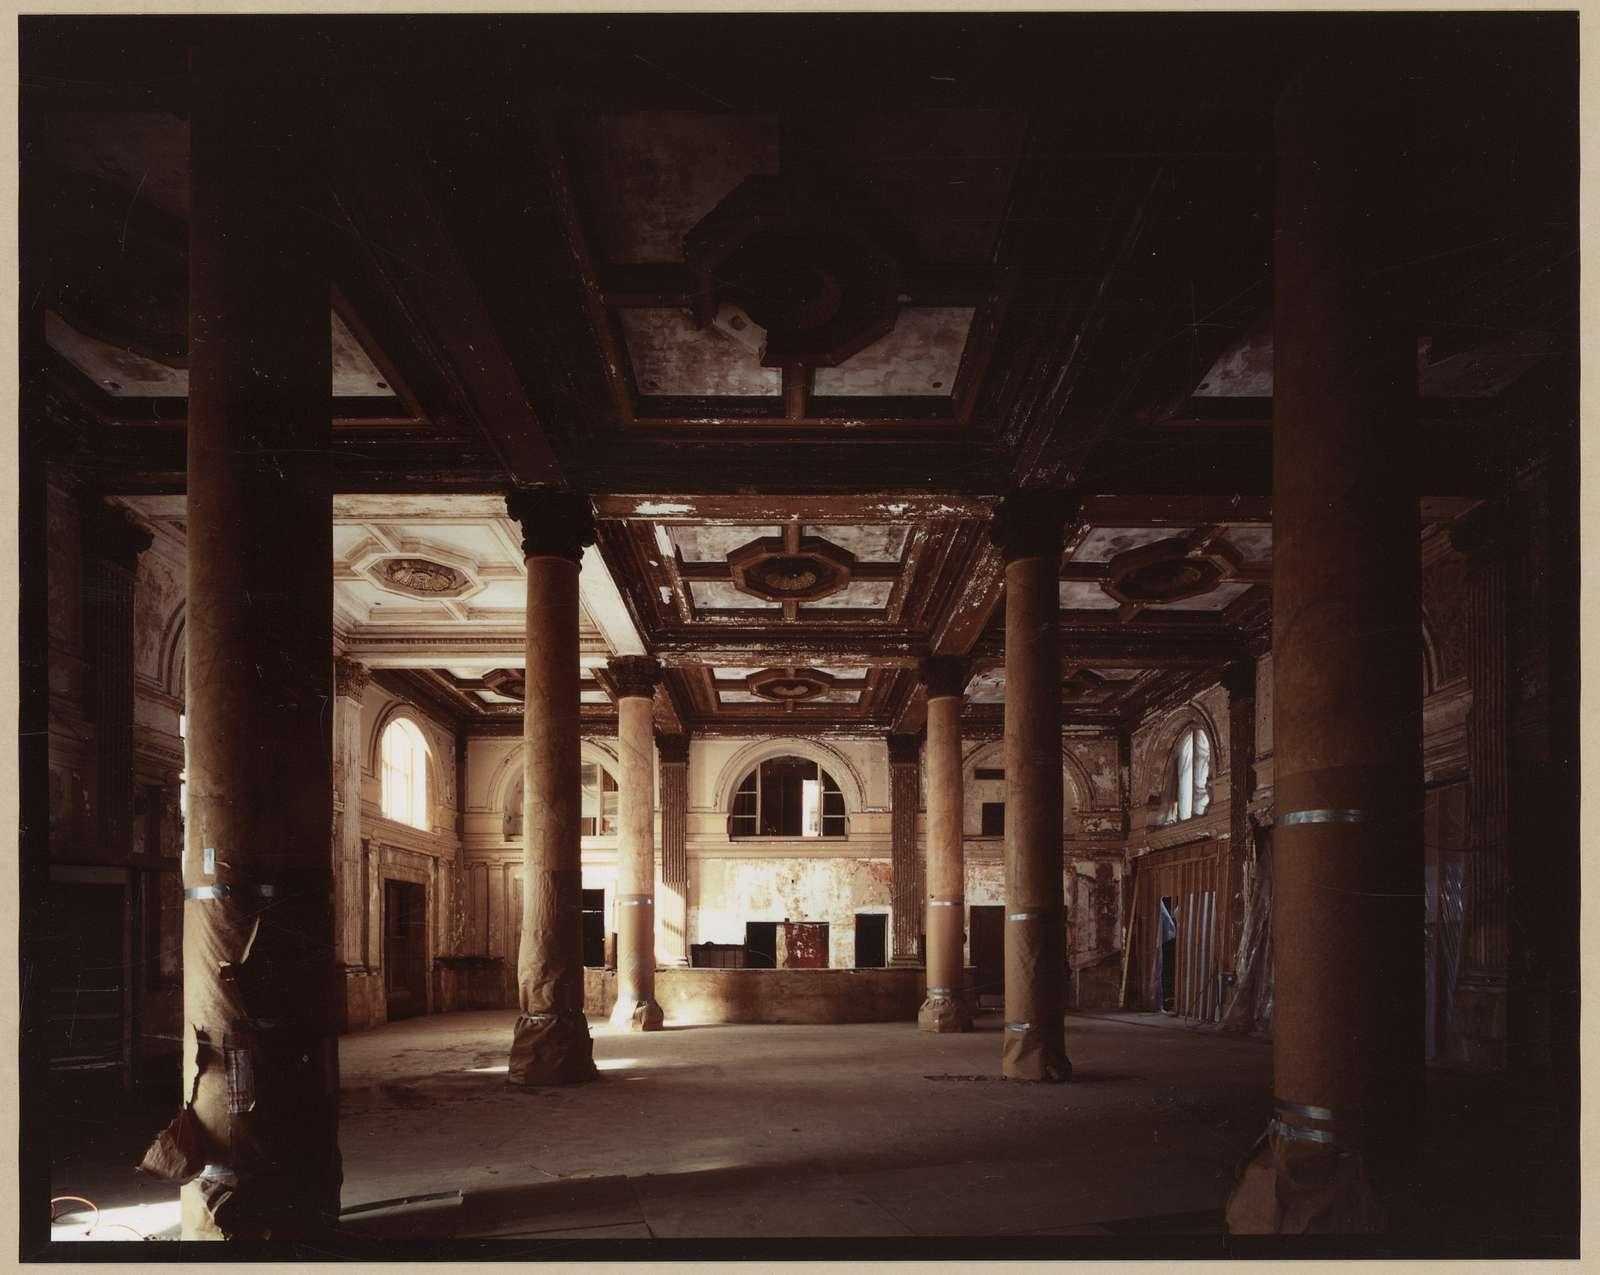 Willard Hotel lobby after cleanup, before restoration, 1984 / C.M. Highsmith.